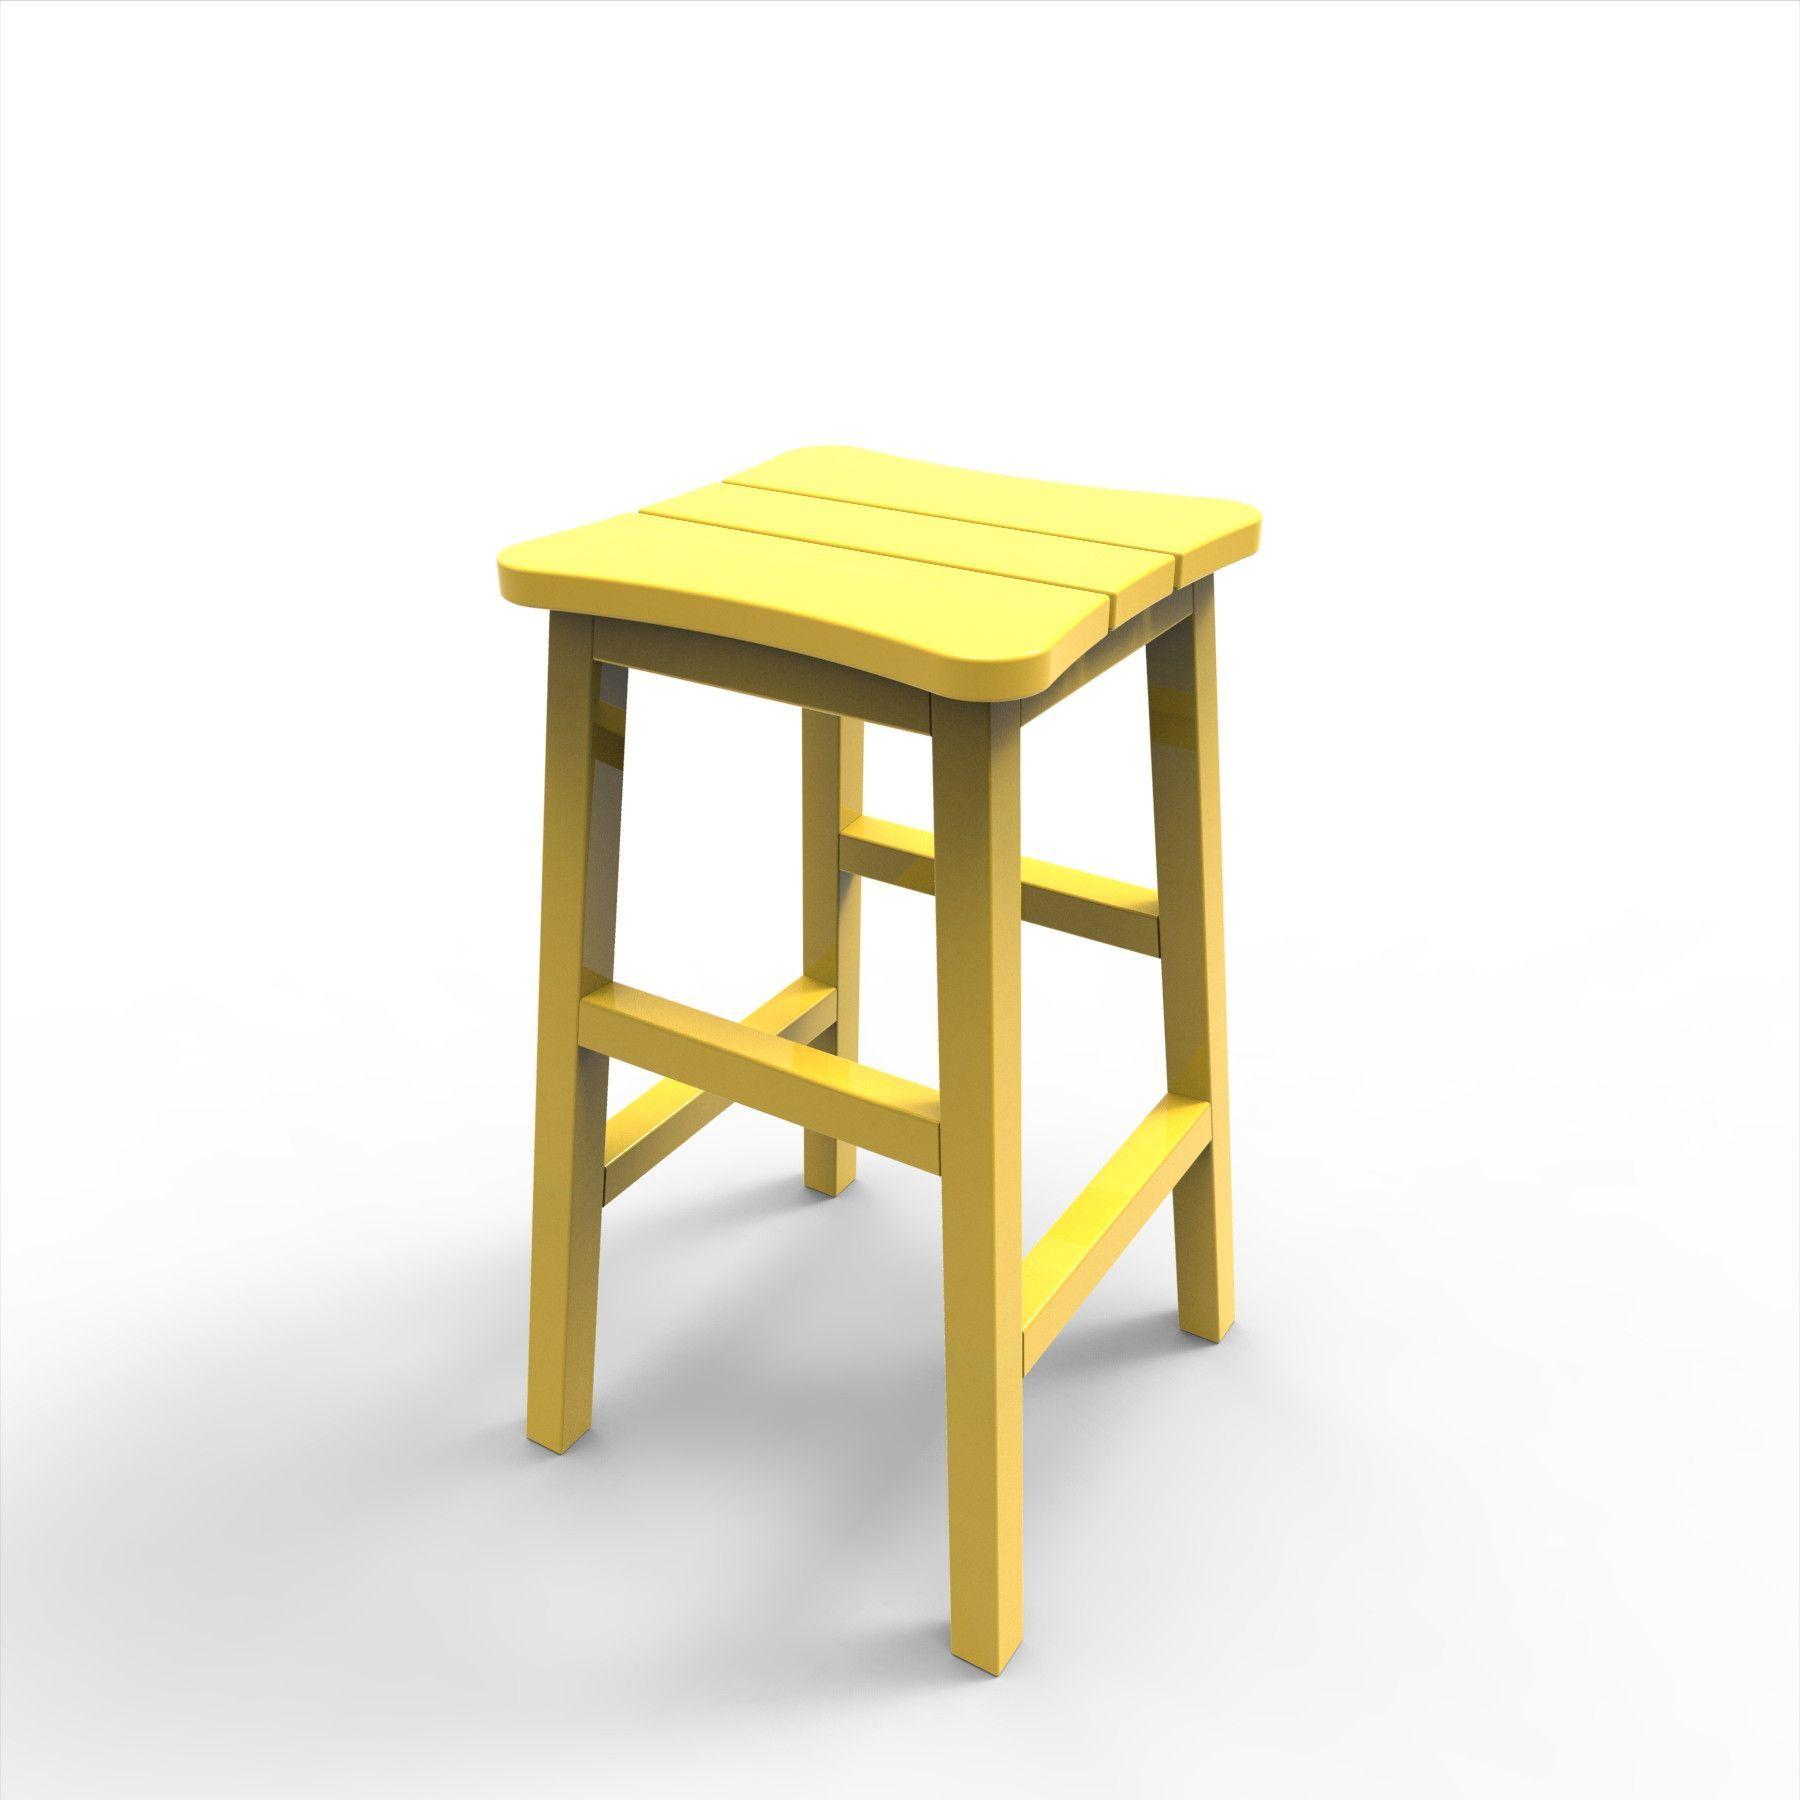 malibu outdoor living recycled plastic malibu outdoor living recycled plastic bar stool products